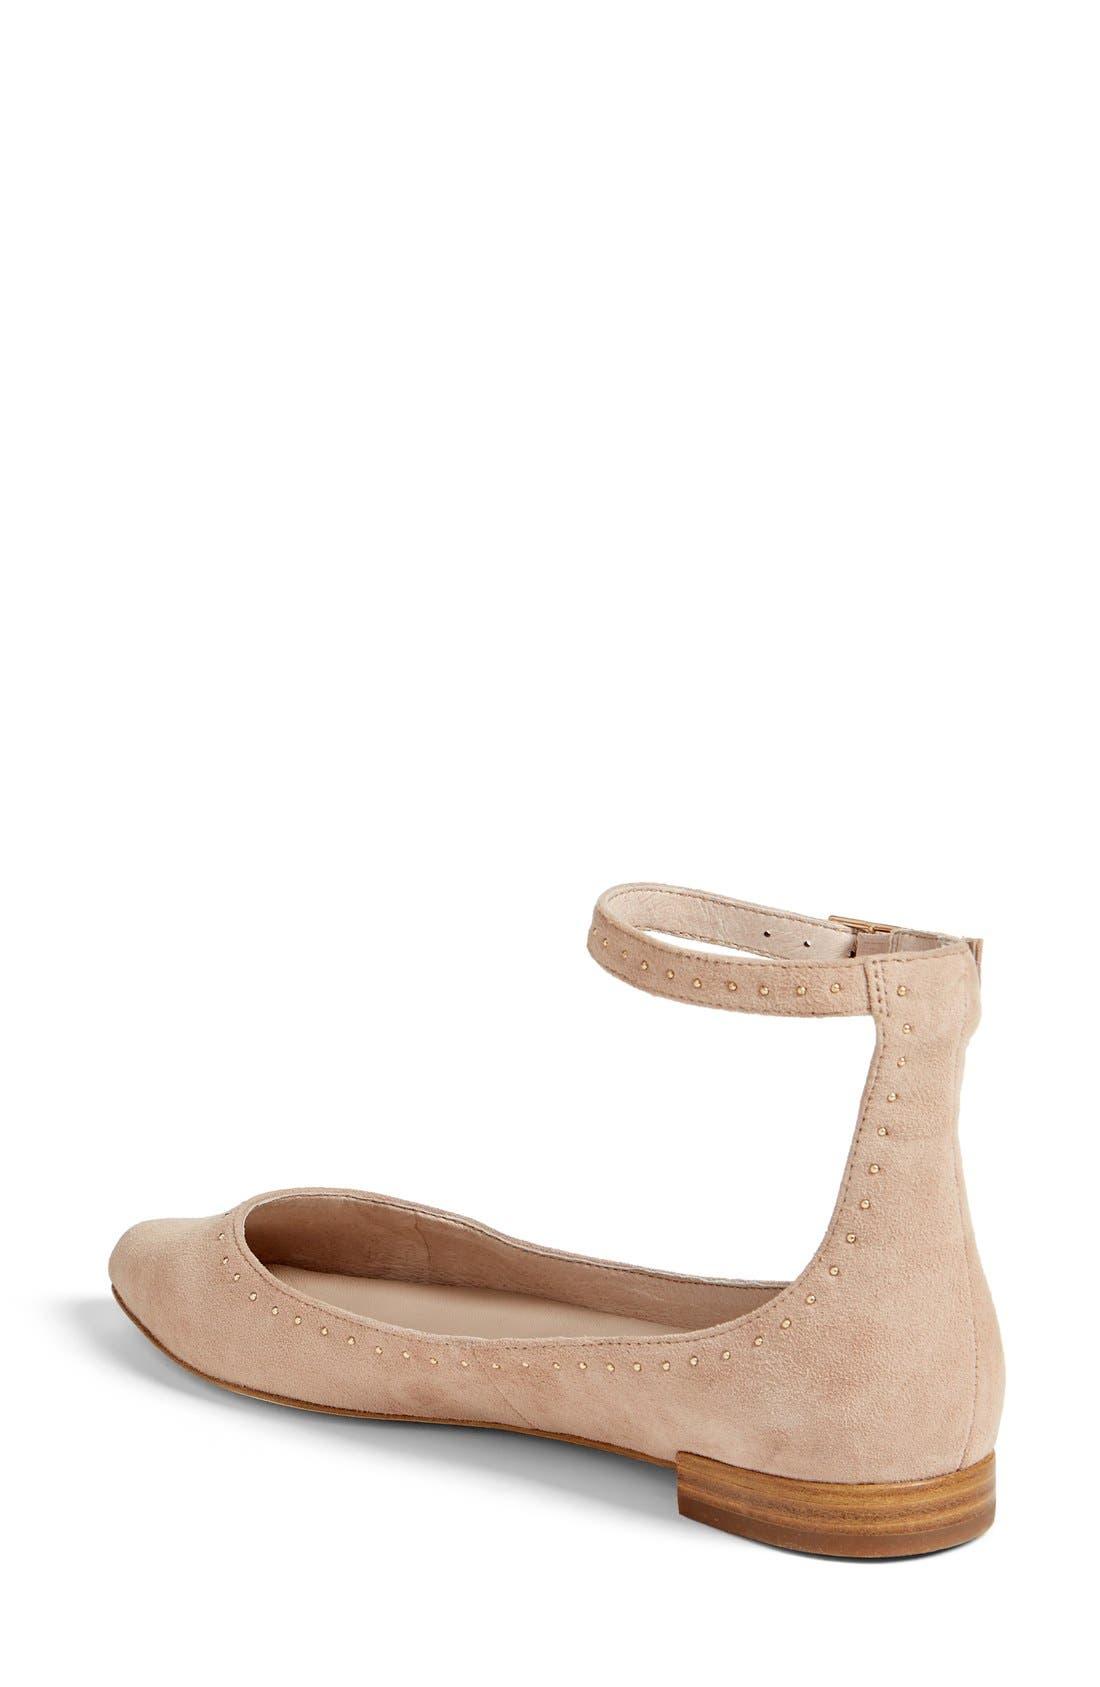 Afra Ankle Strap Ballet Flat,                             Alternate thumbnail 3, color,                             250